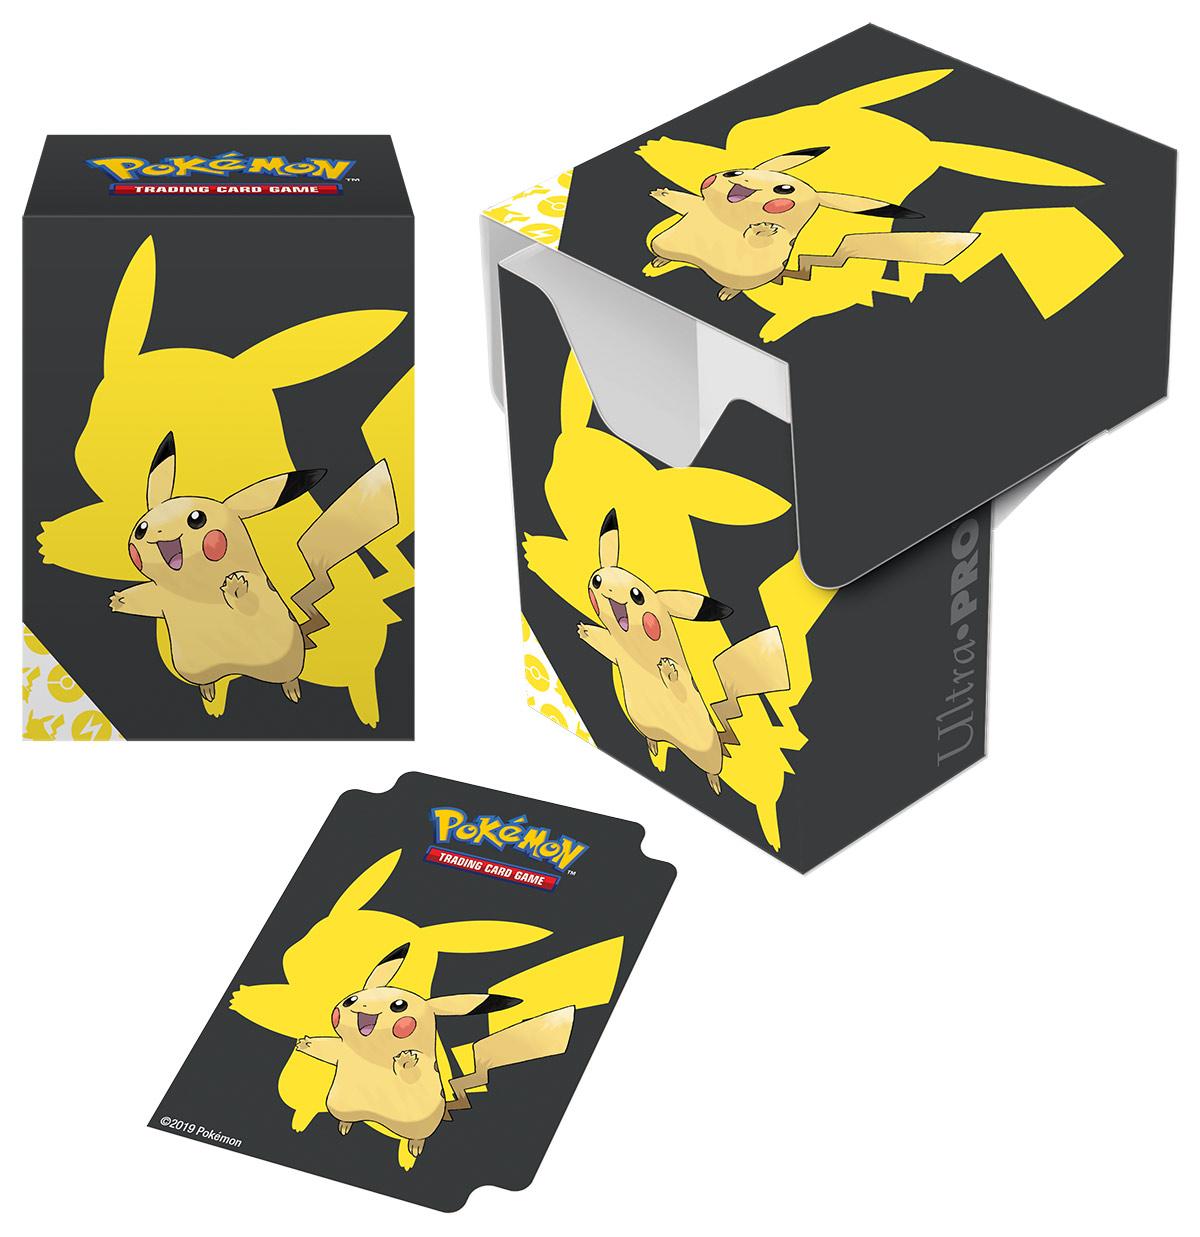 Pokemon Tcg: Pikachu 2019 Full View Deck Box Game Box